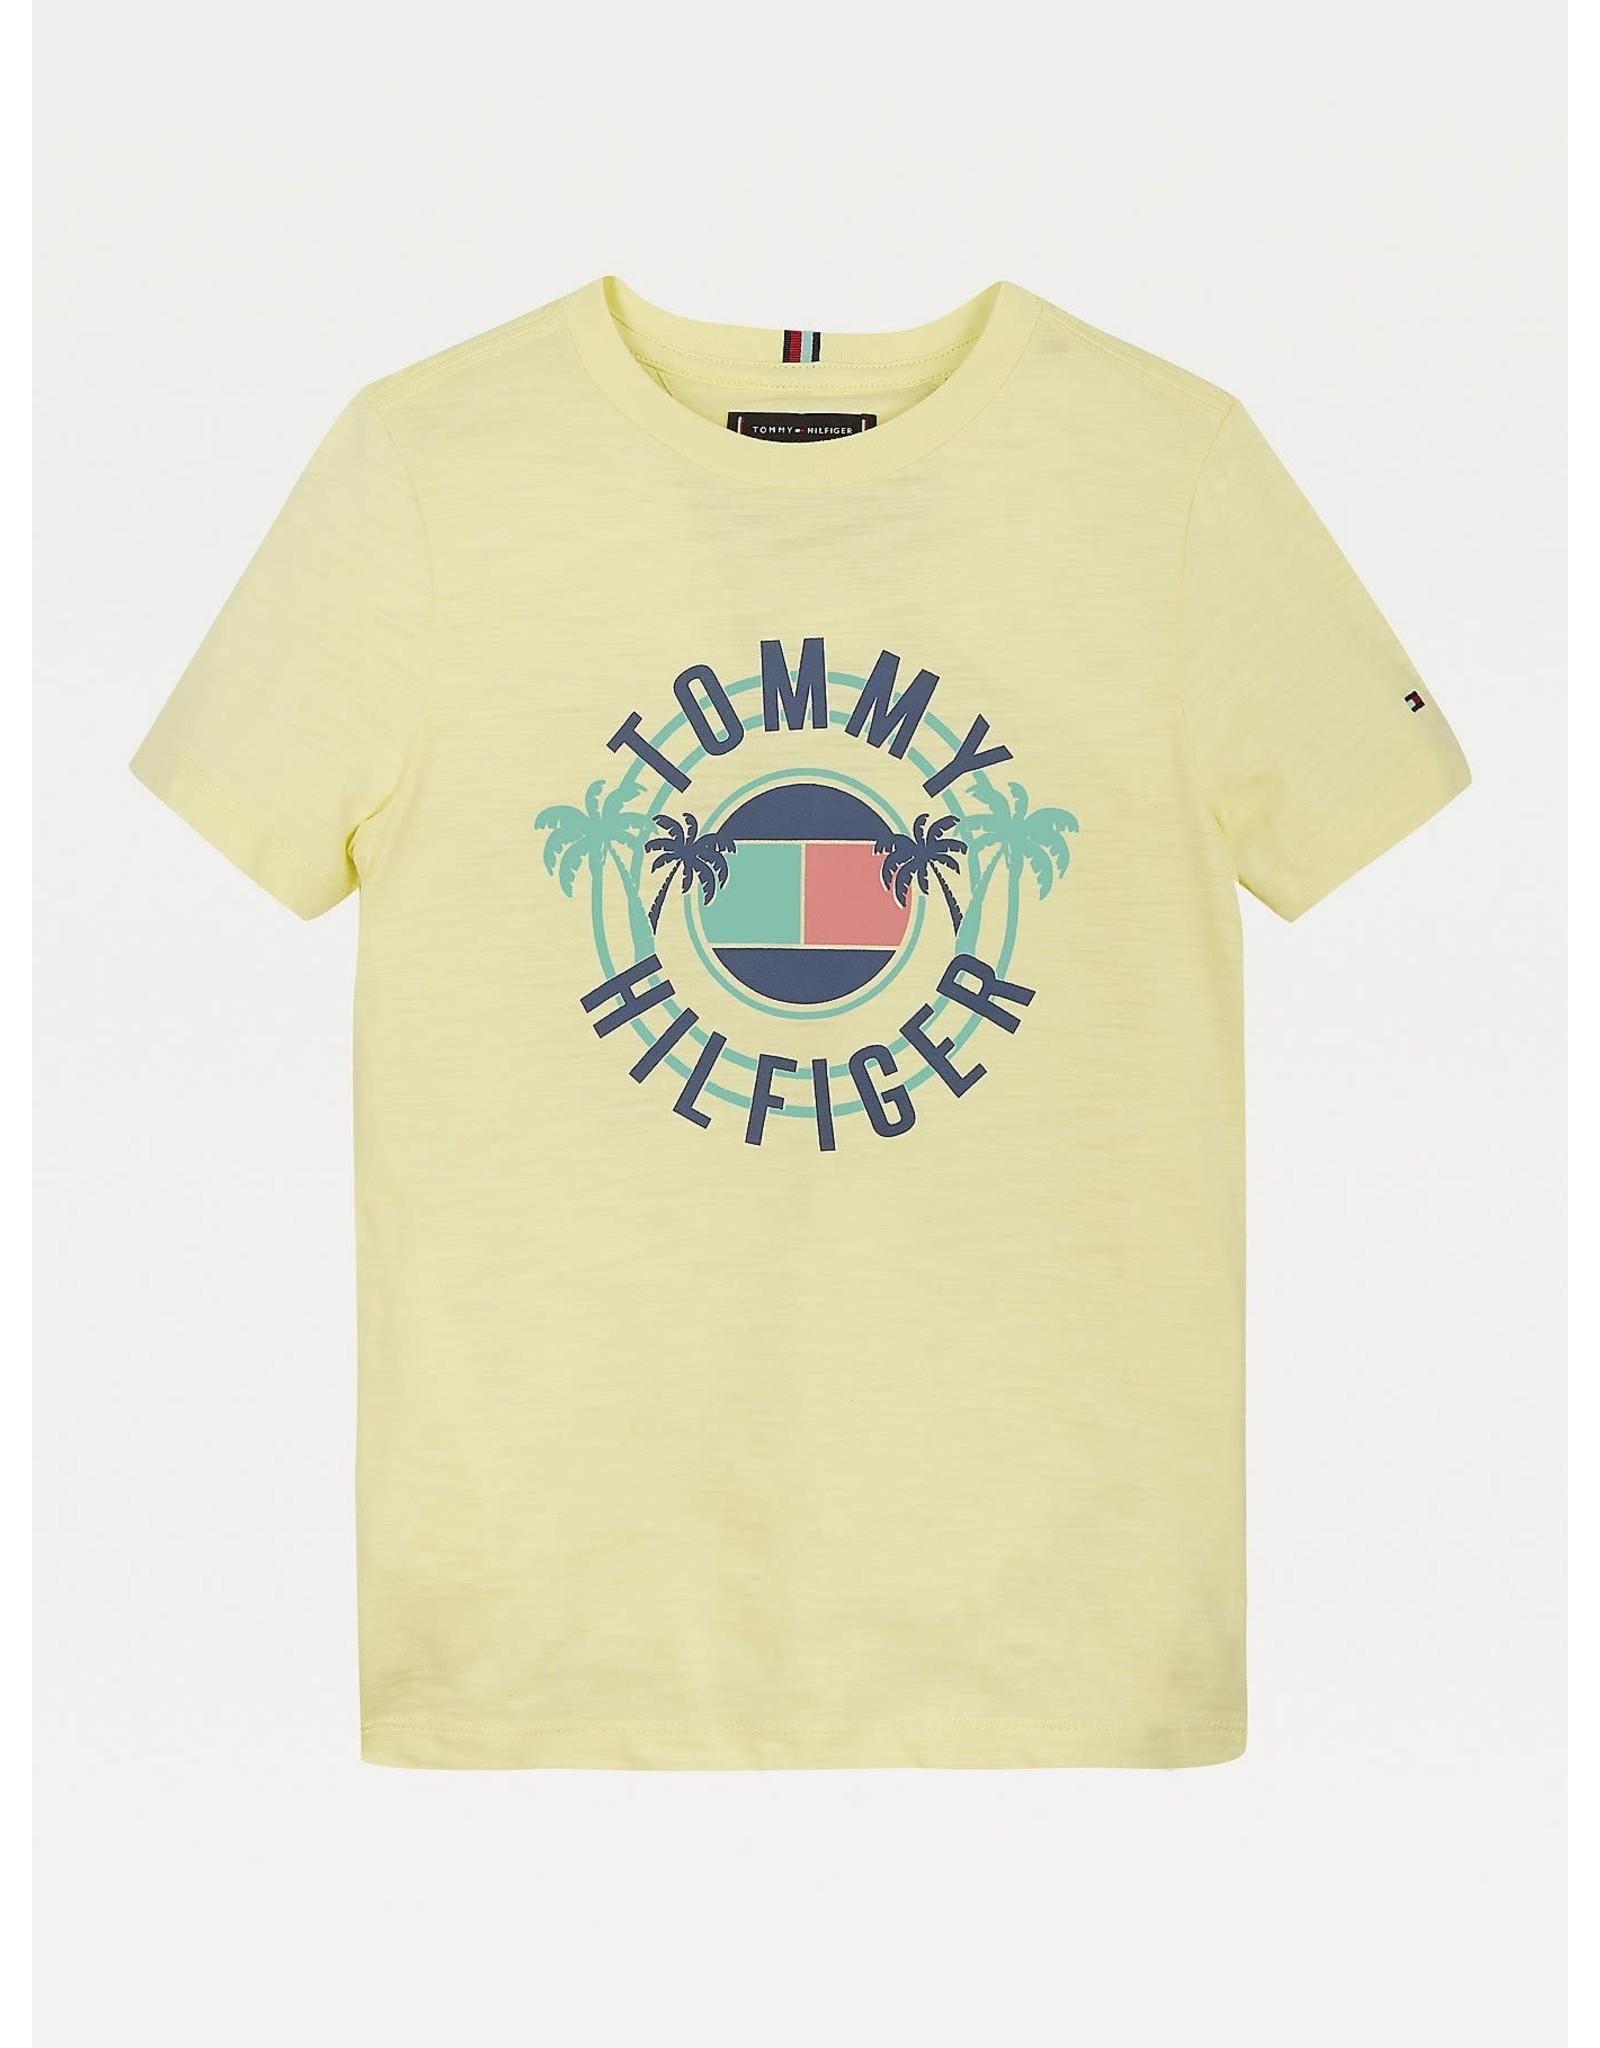 Tommy Hilfiger 5845 T-Shirt